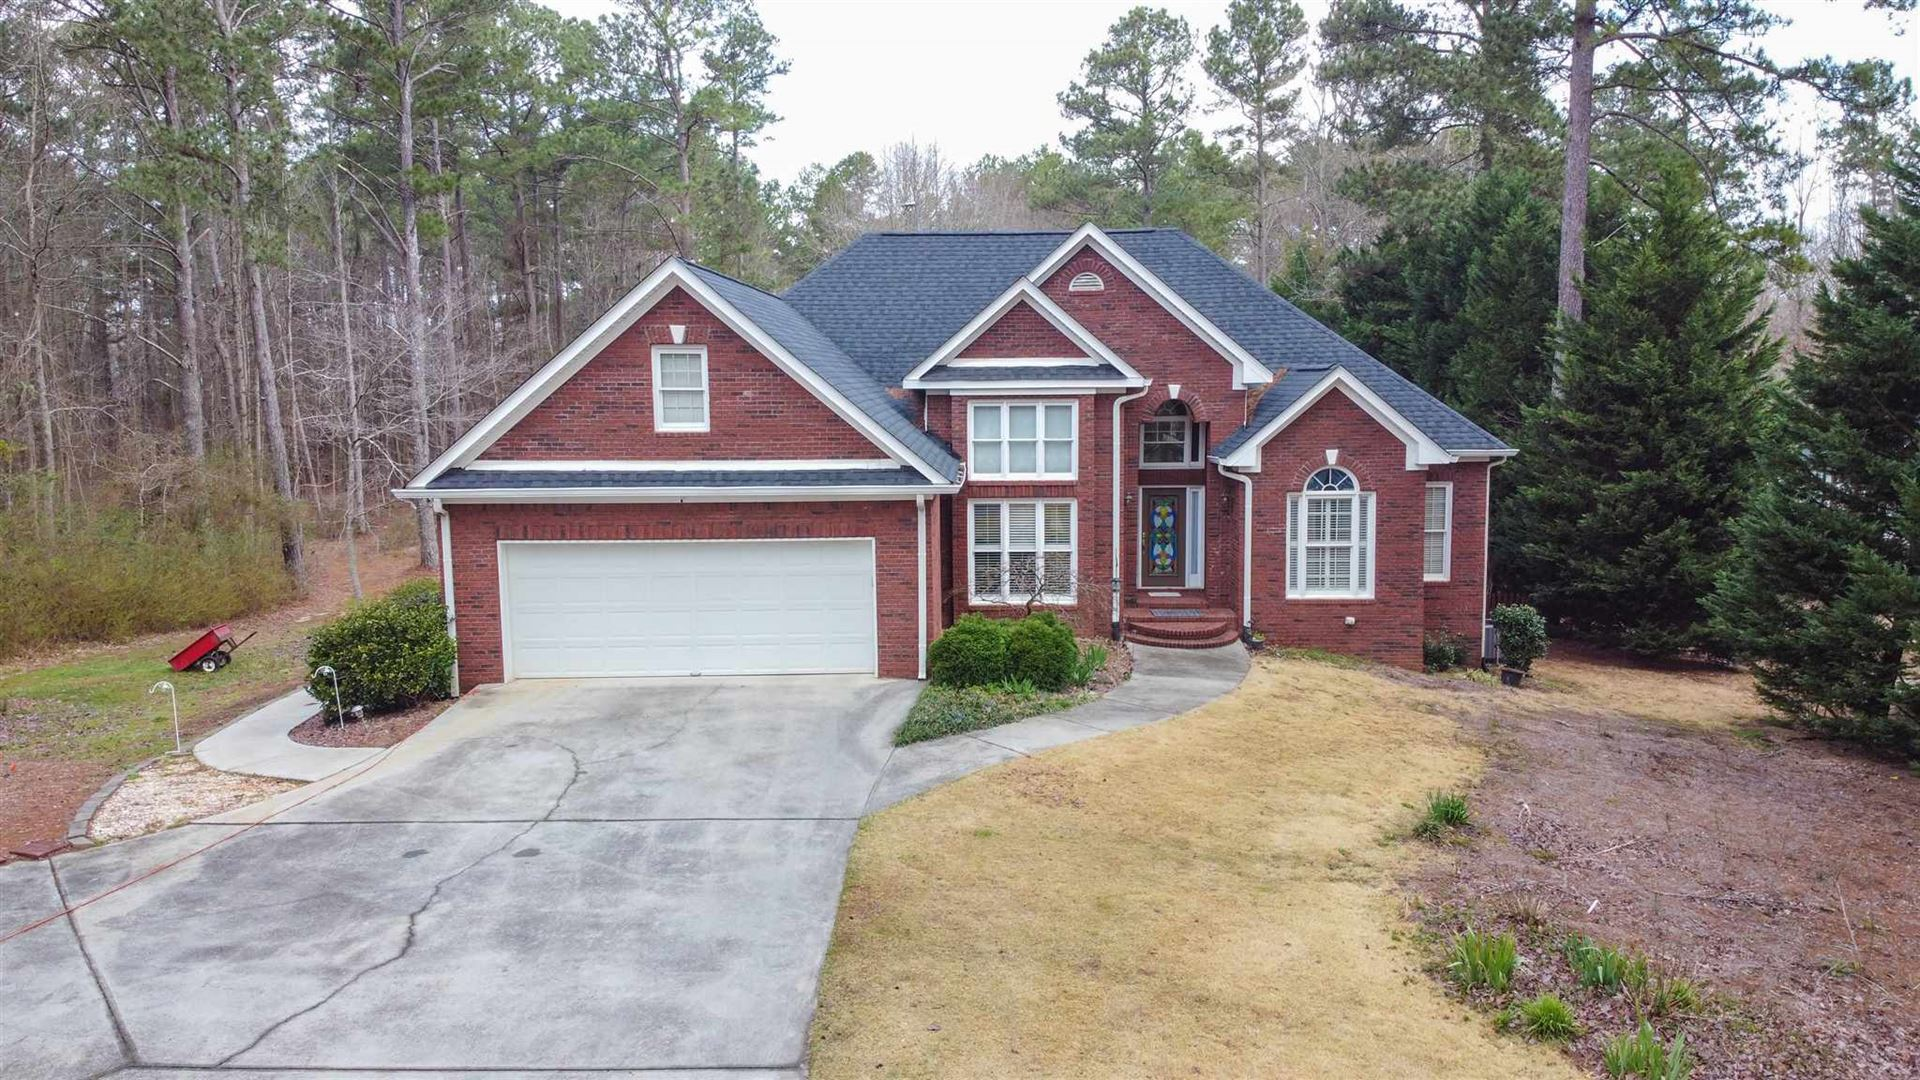 560 Herring, Grayson, GA 30017 - MLS#: 8751677